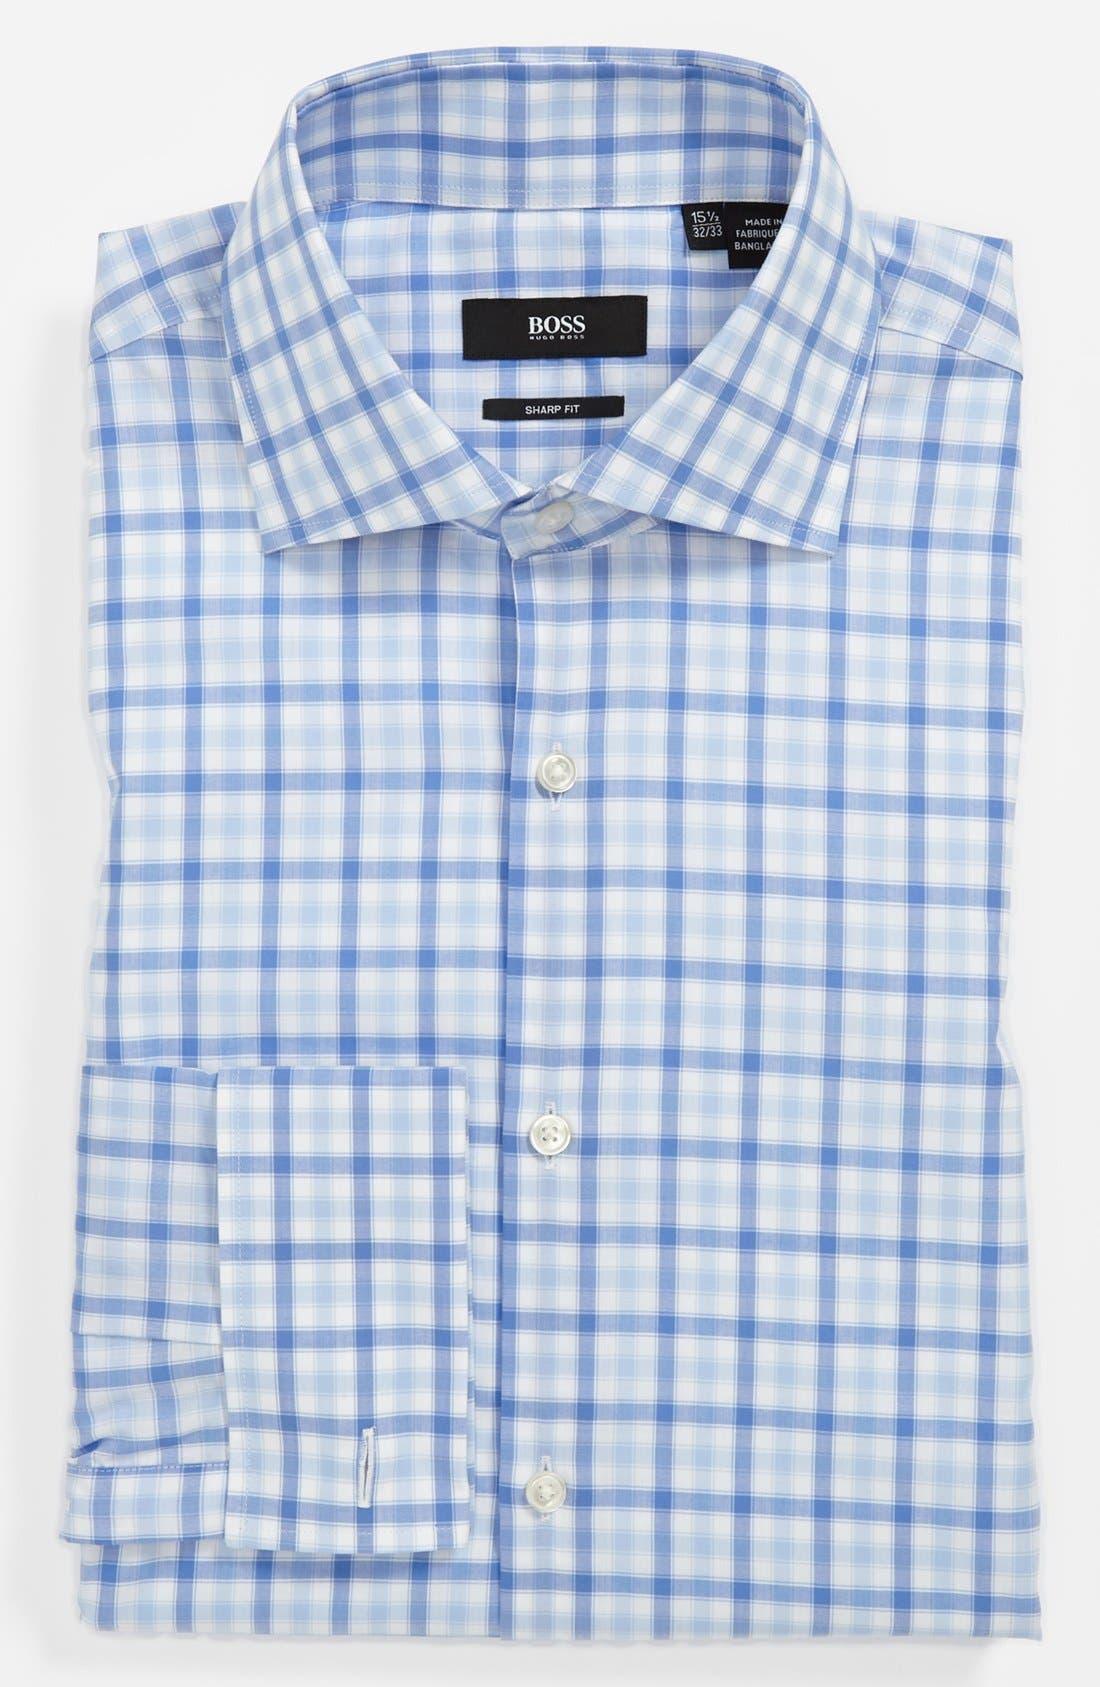 Main Image - BOSS HUGO BOSS 'Malvin' Sharp Fit Dress Shirt